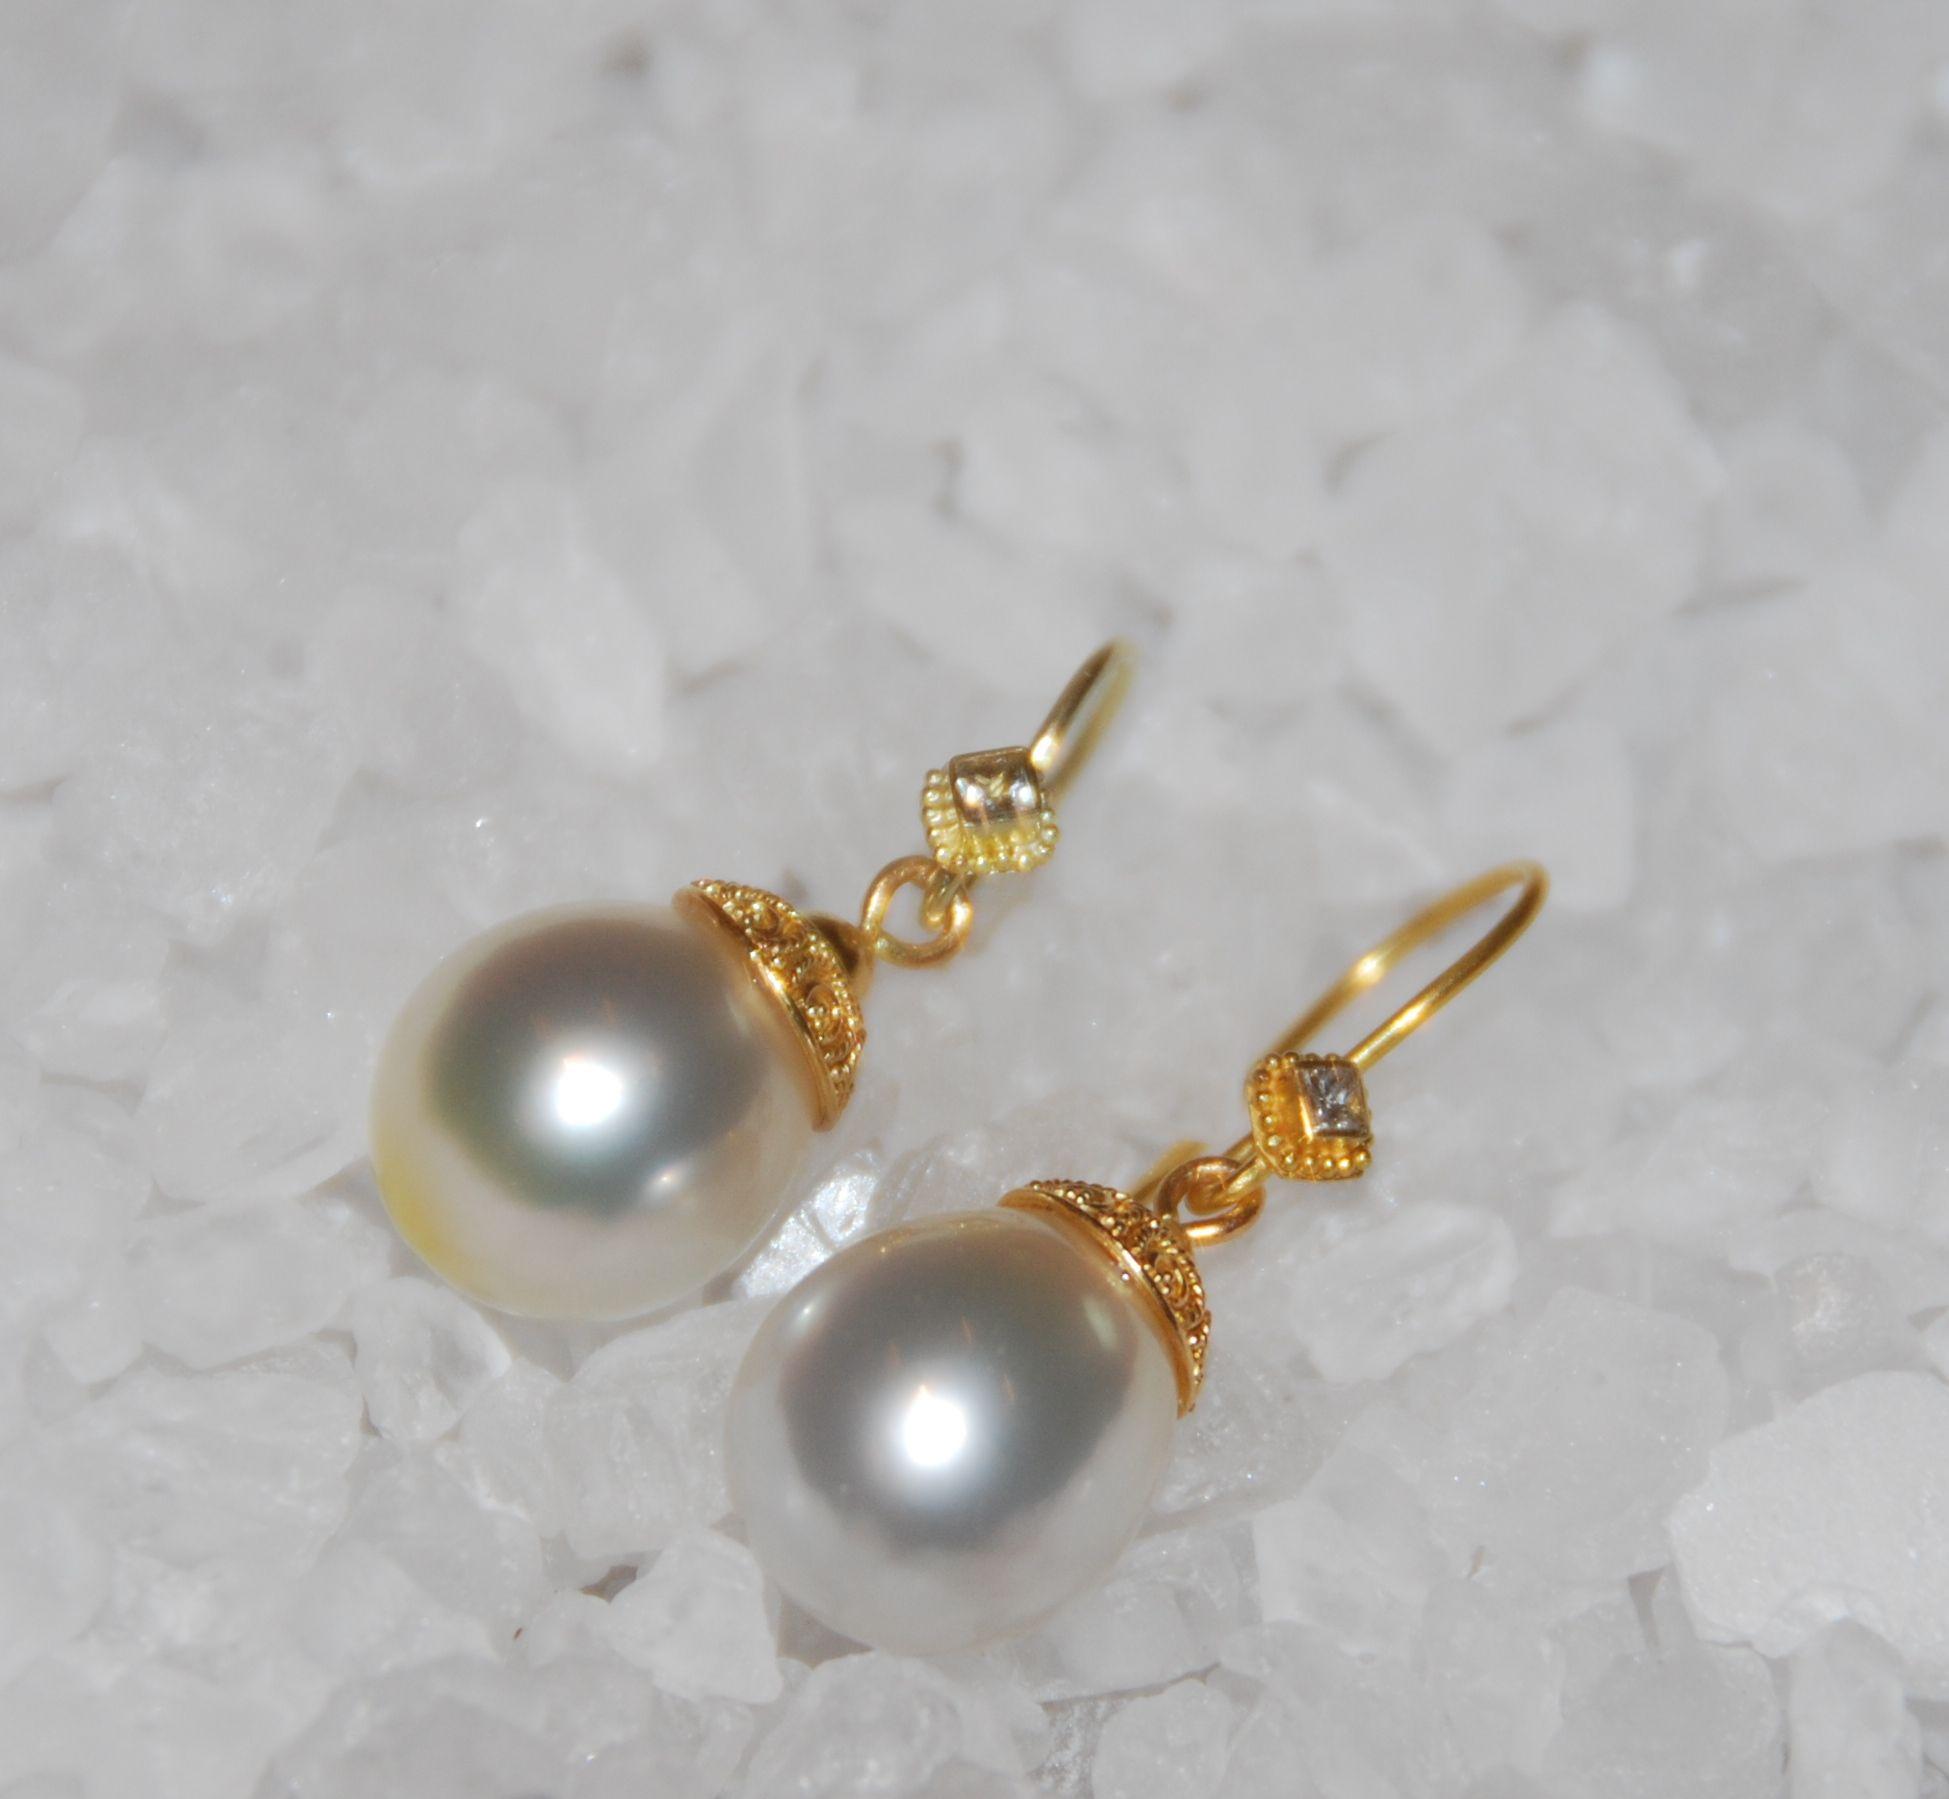 www.studiojacs.com 14 carat gold with diamond and pearl earrings